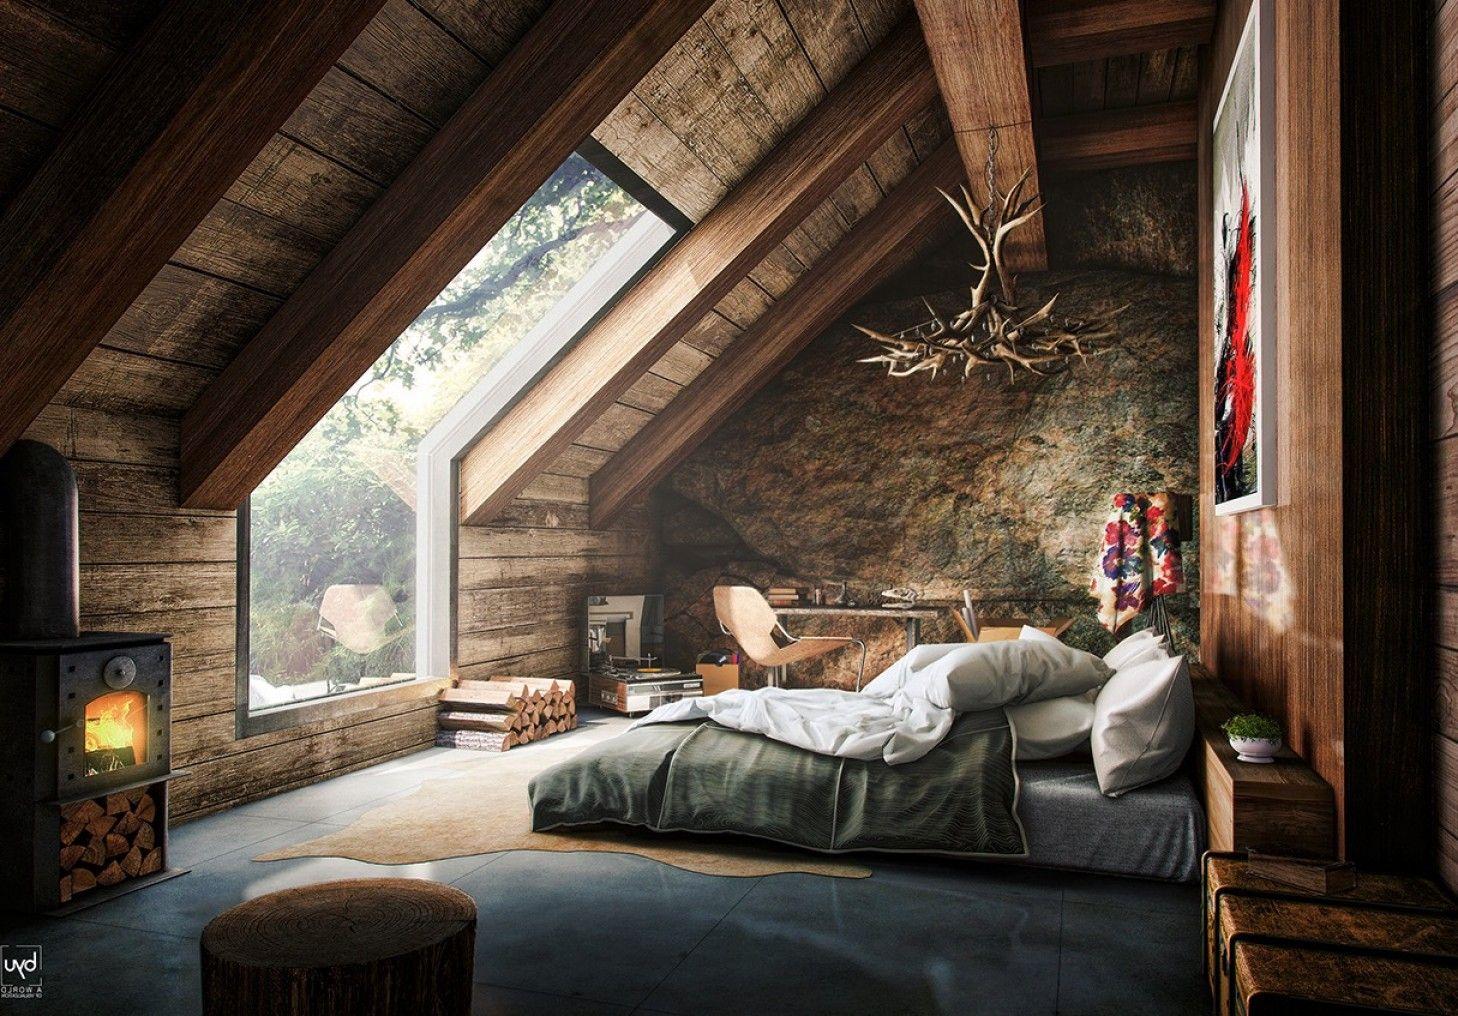 Loft bedroom style   Luxury Loft Bedroom Ideas To Enhance Your Home  Loft bedrooms